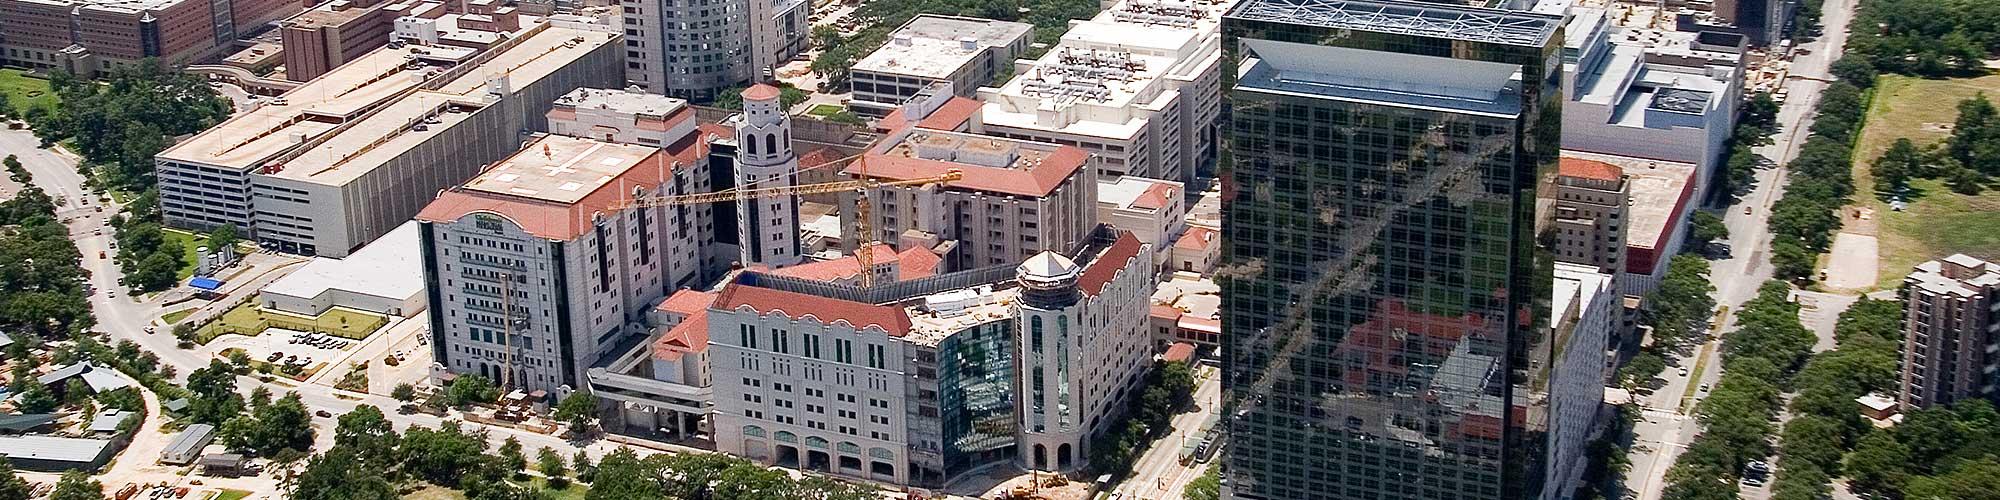 Memorial Hermann-Texas Medical Center